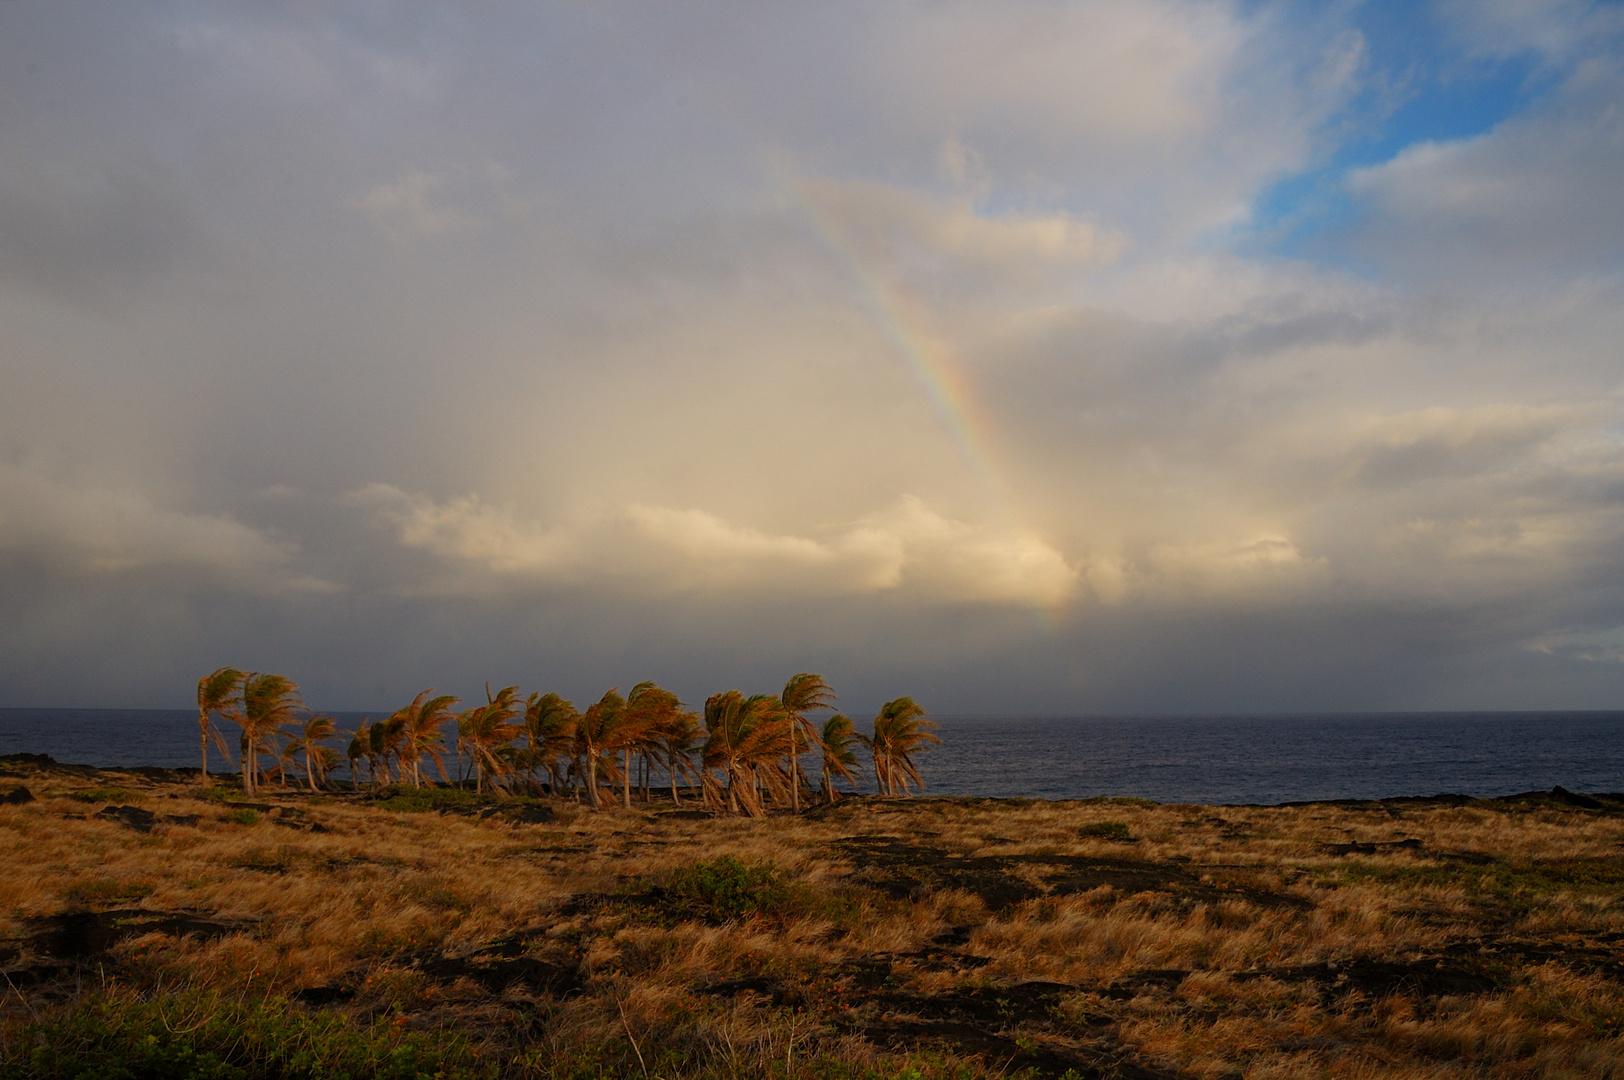 Sturm, Regen, Sonnen ... Regenbogen!